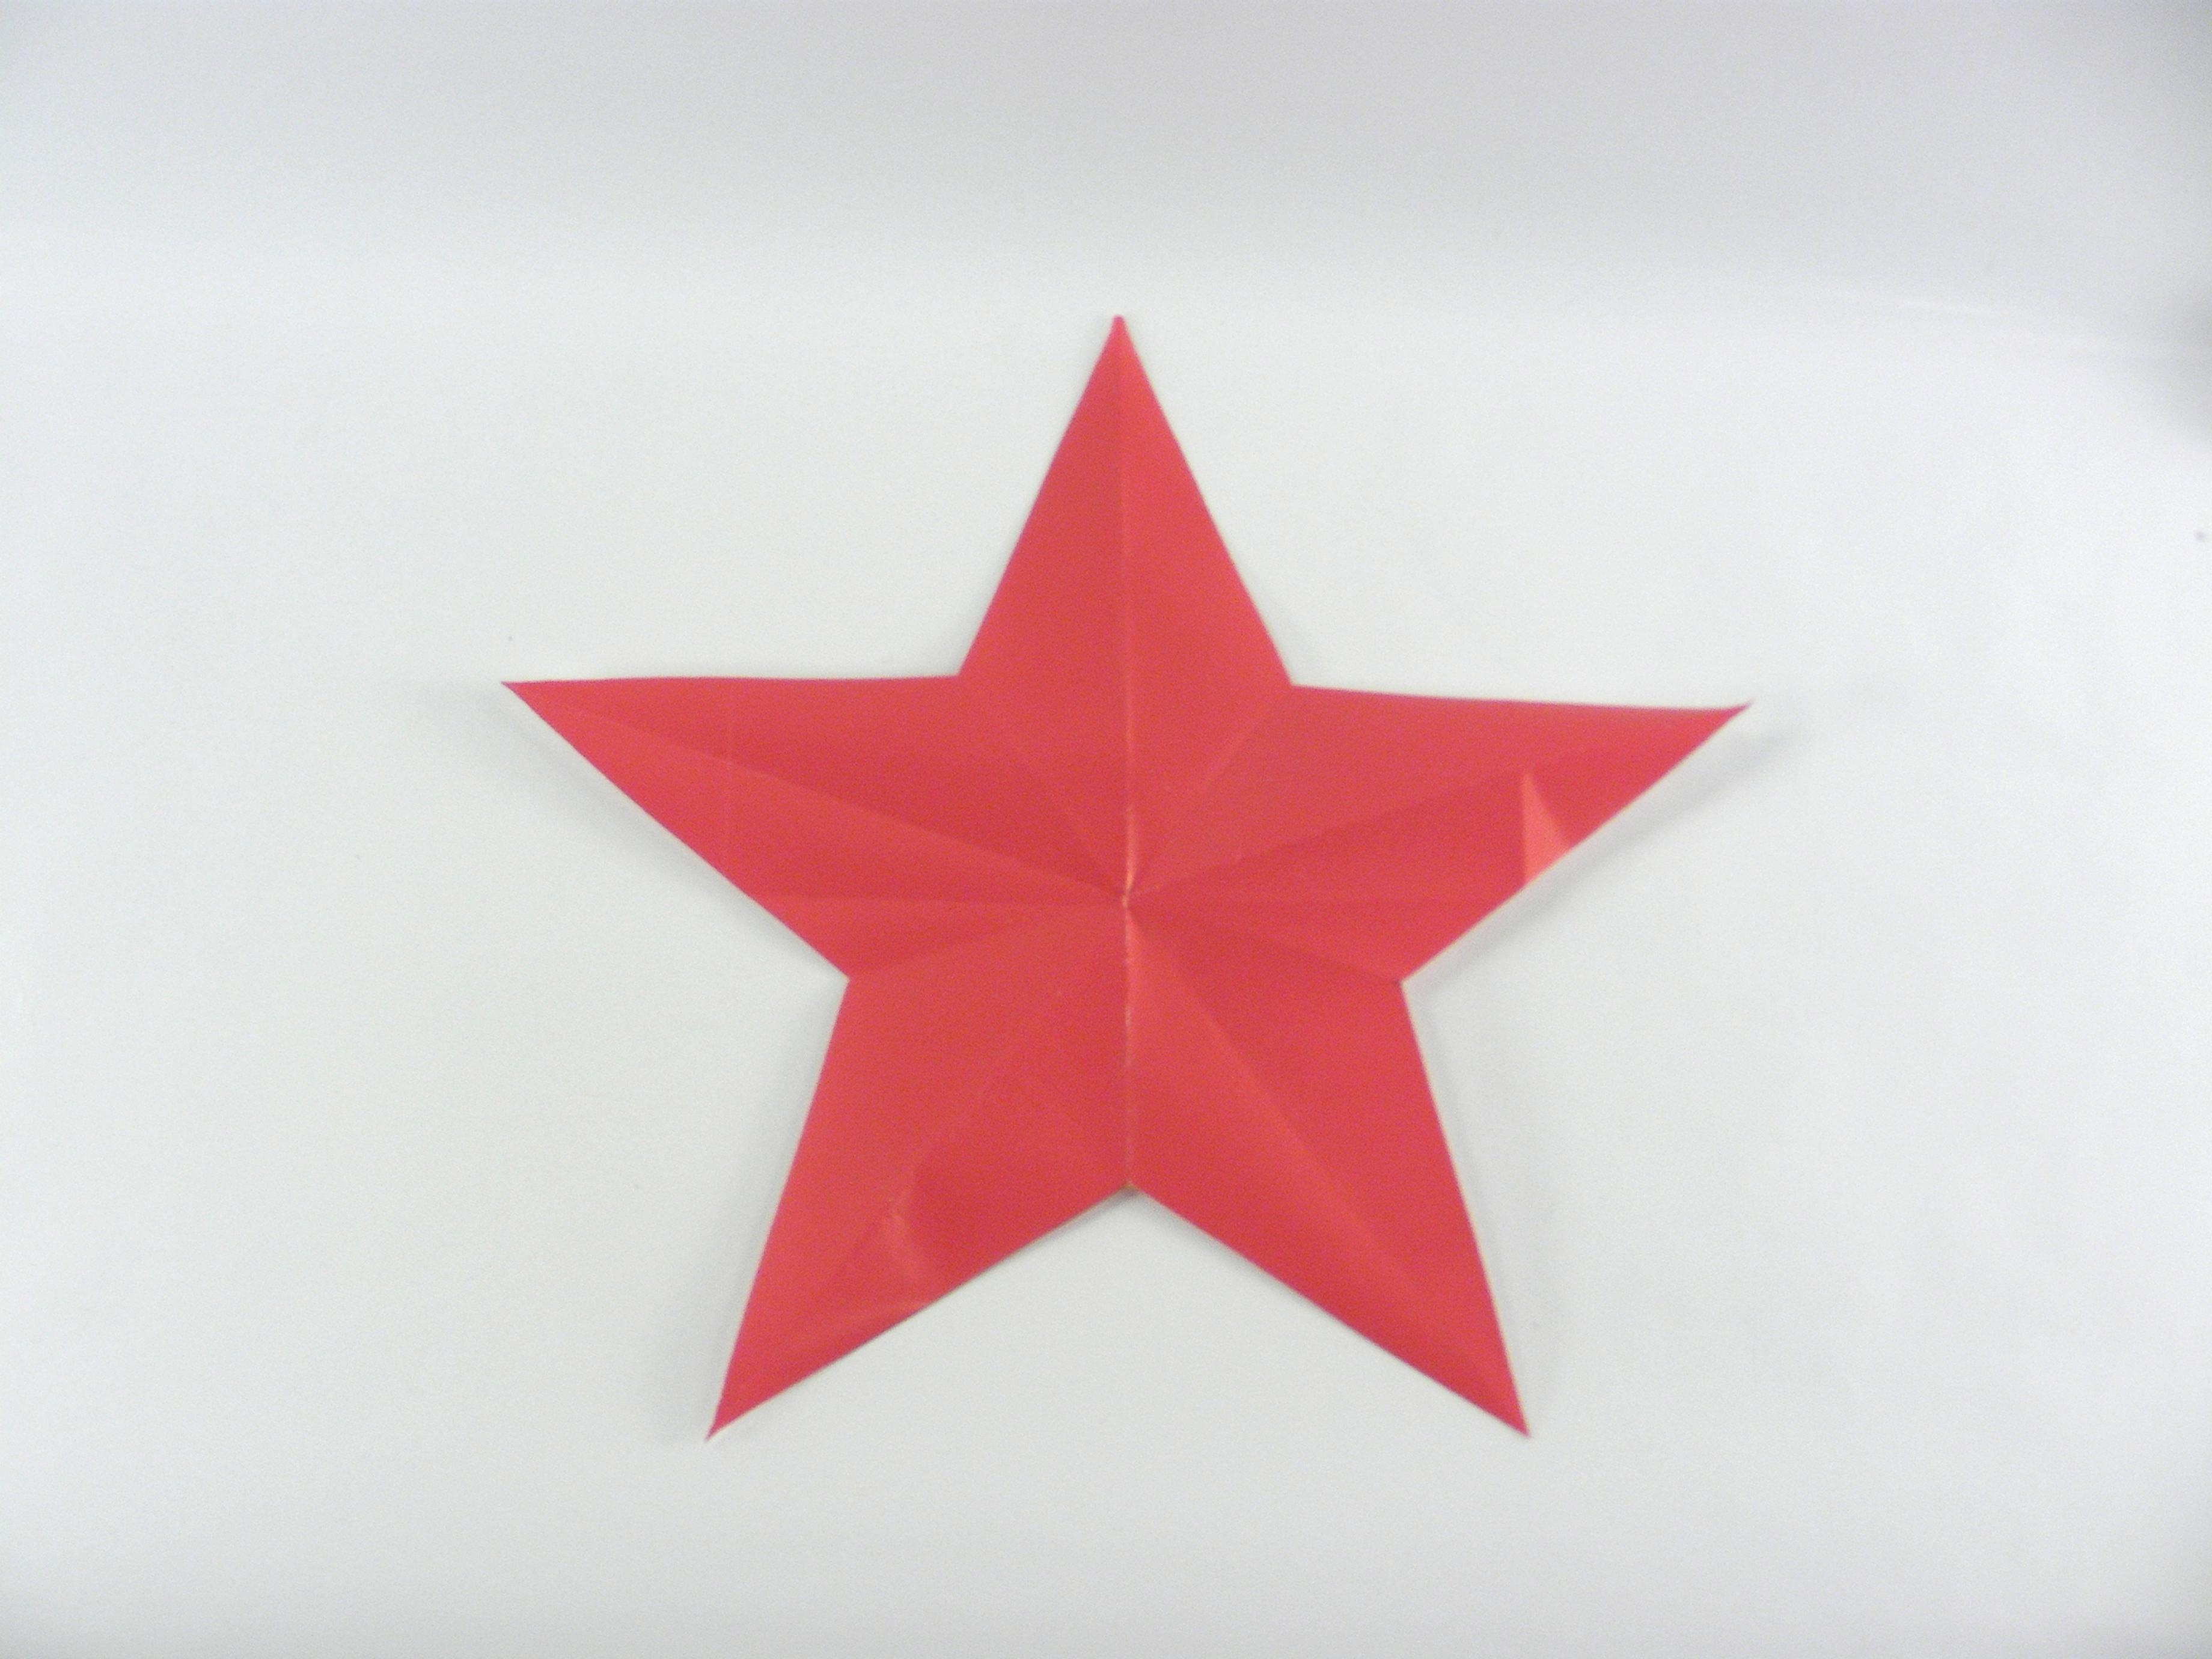 Toys, Tricks, & Teasers — Golden Star Origami